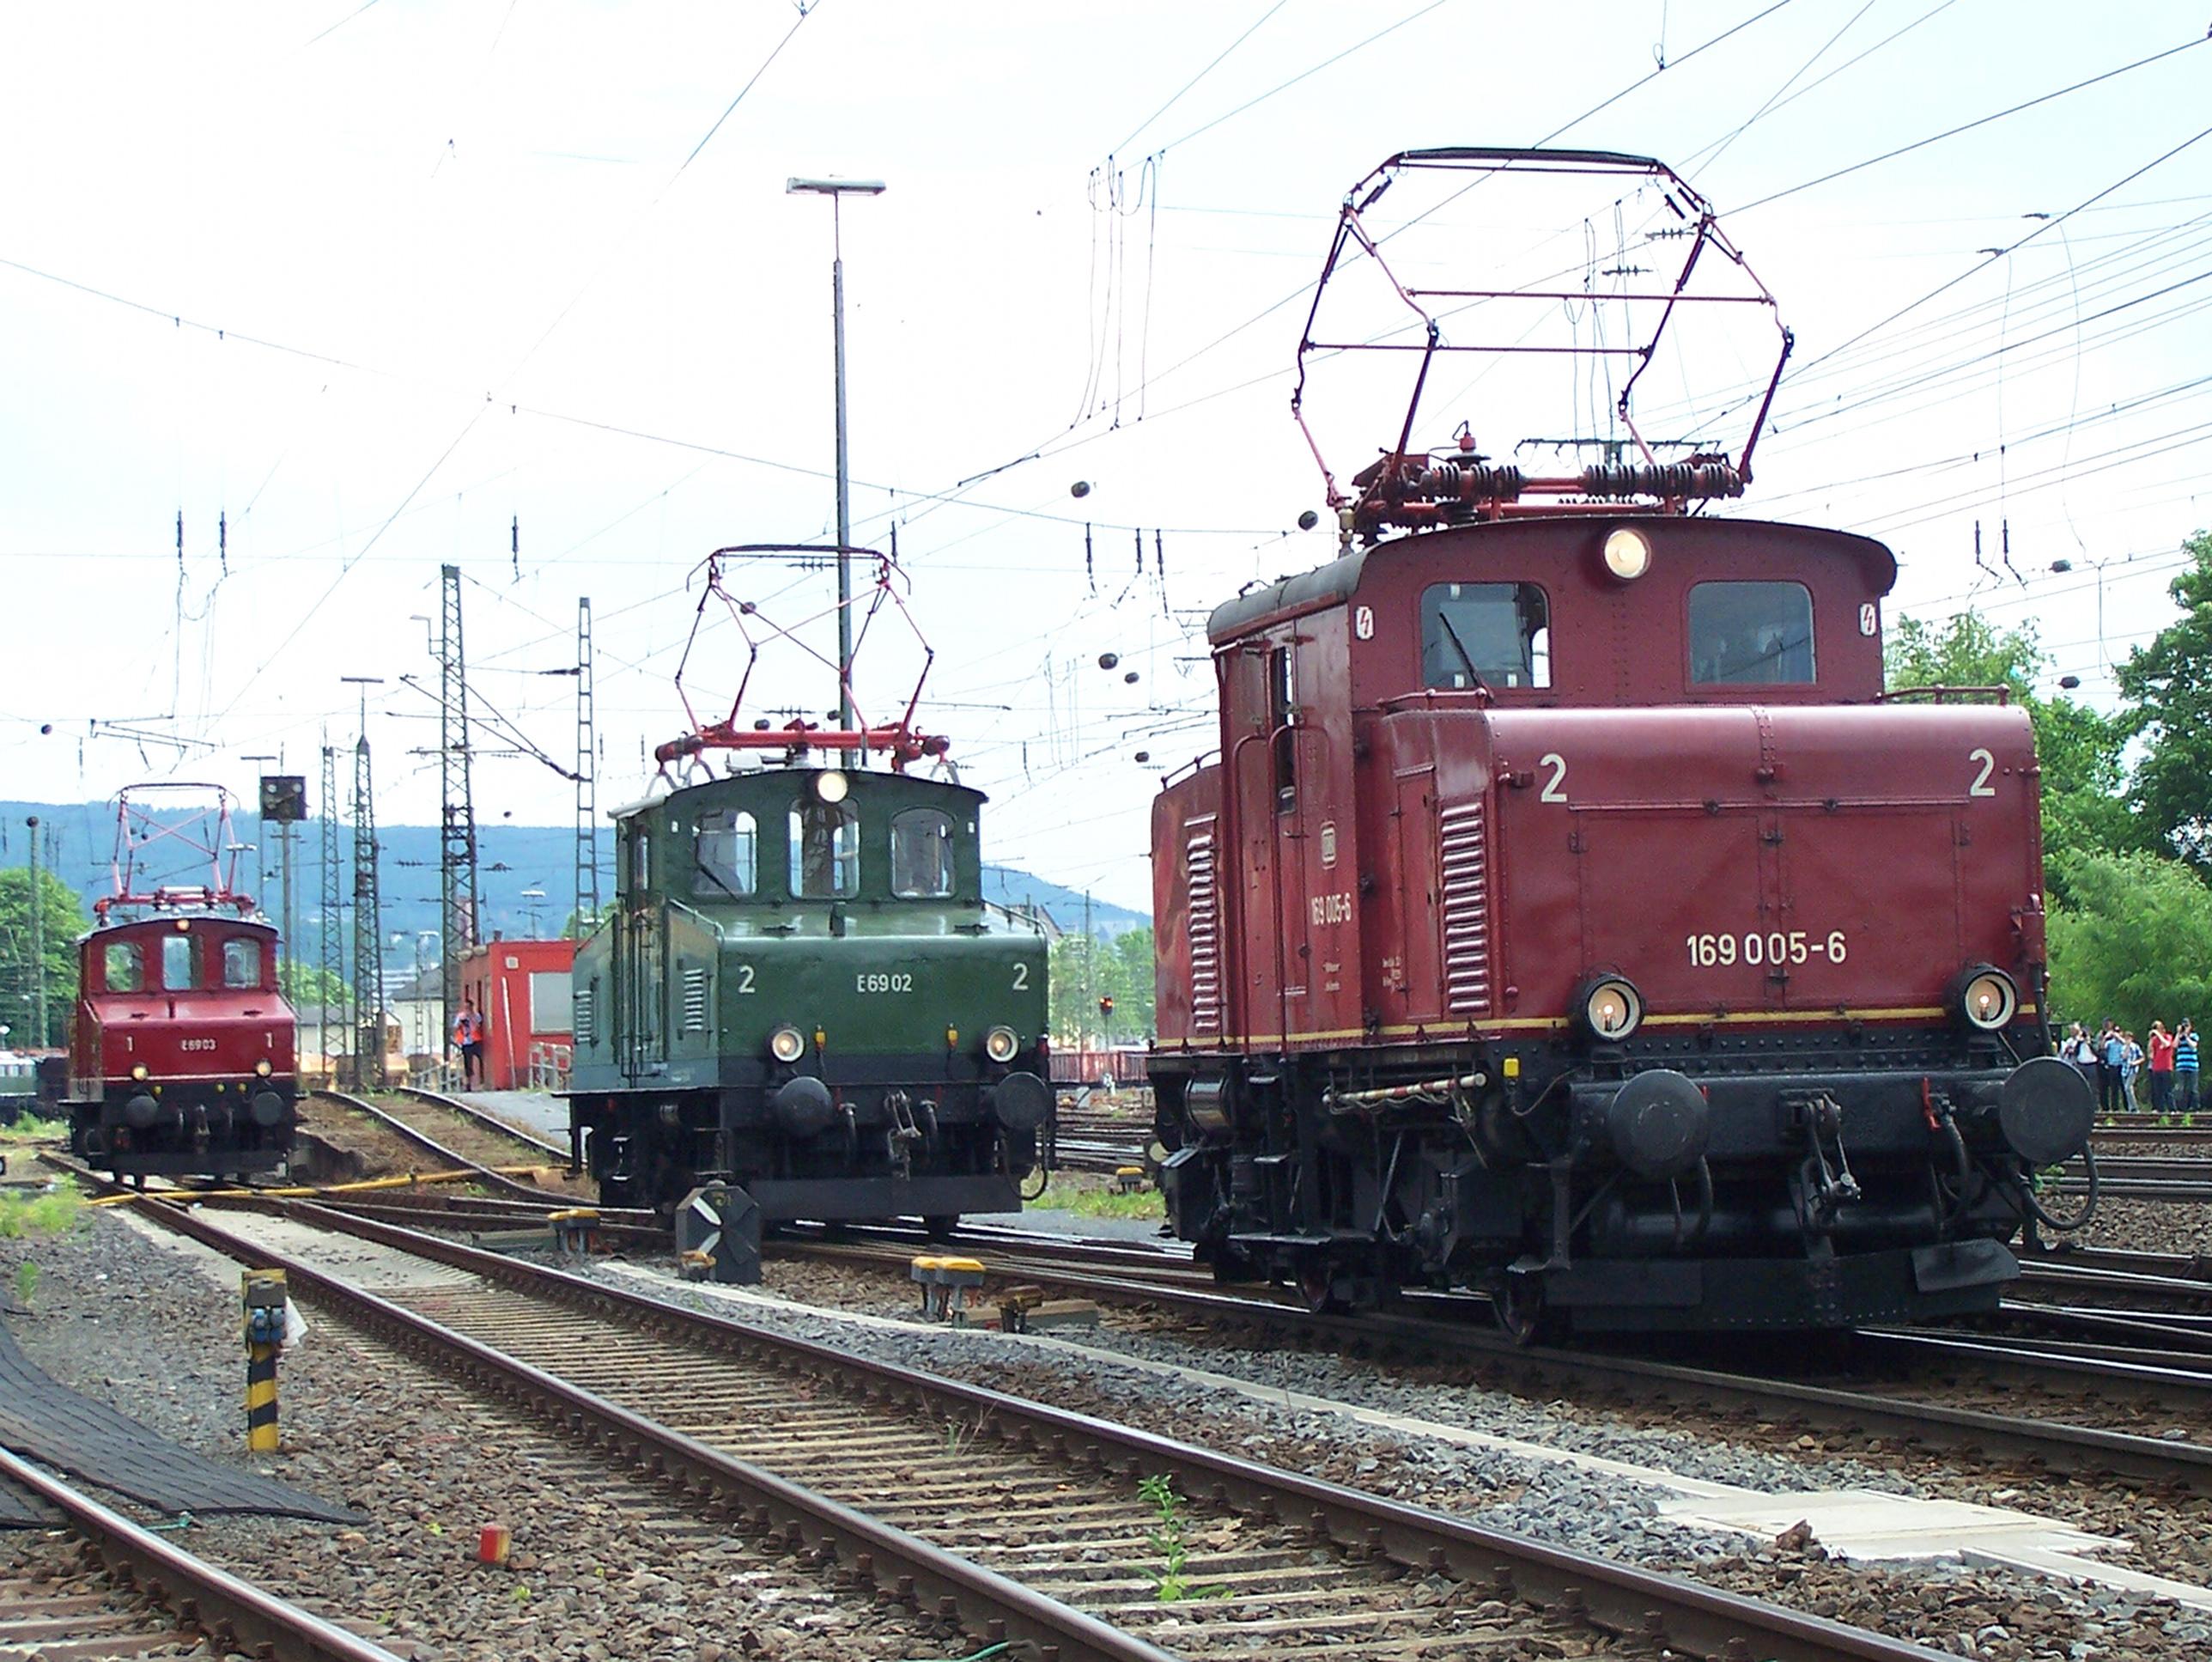 Baijerin paikku: Murnau-Oberammergau-rata